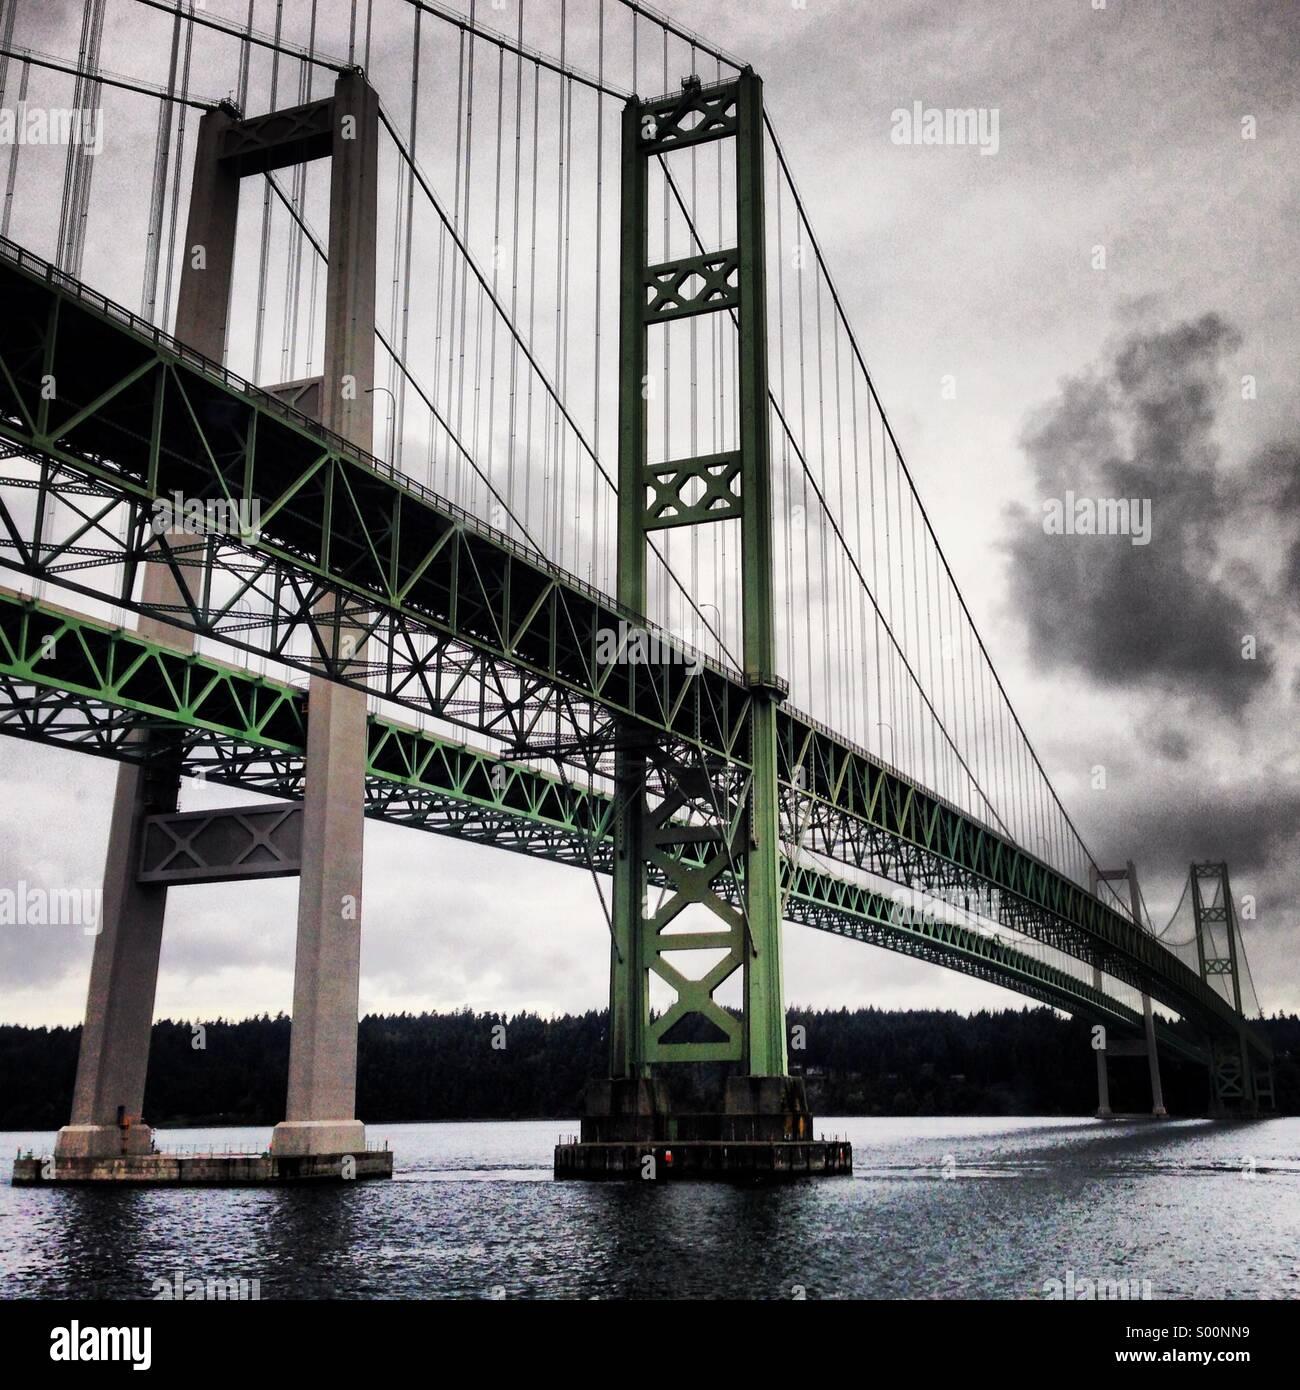 Tacoma Narrows Bridge in Washington state, USA - Stock Image